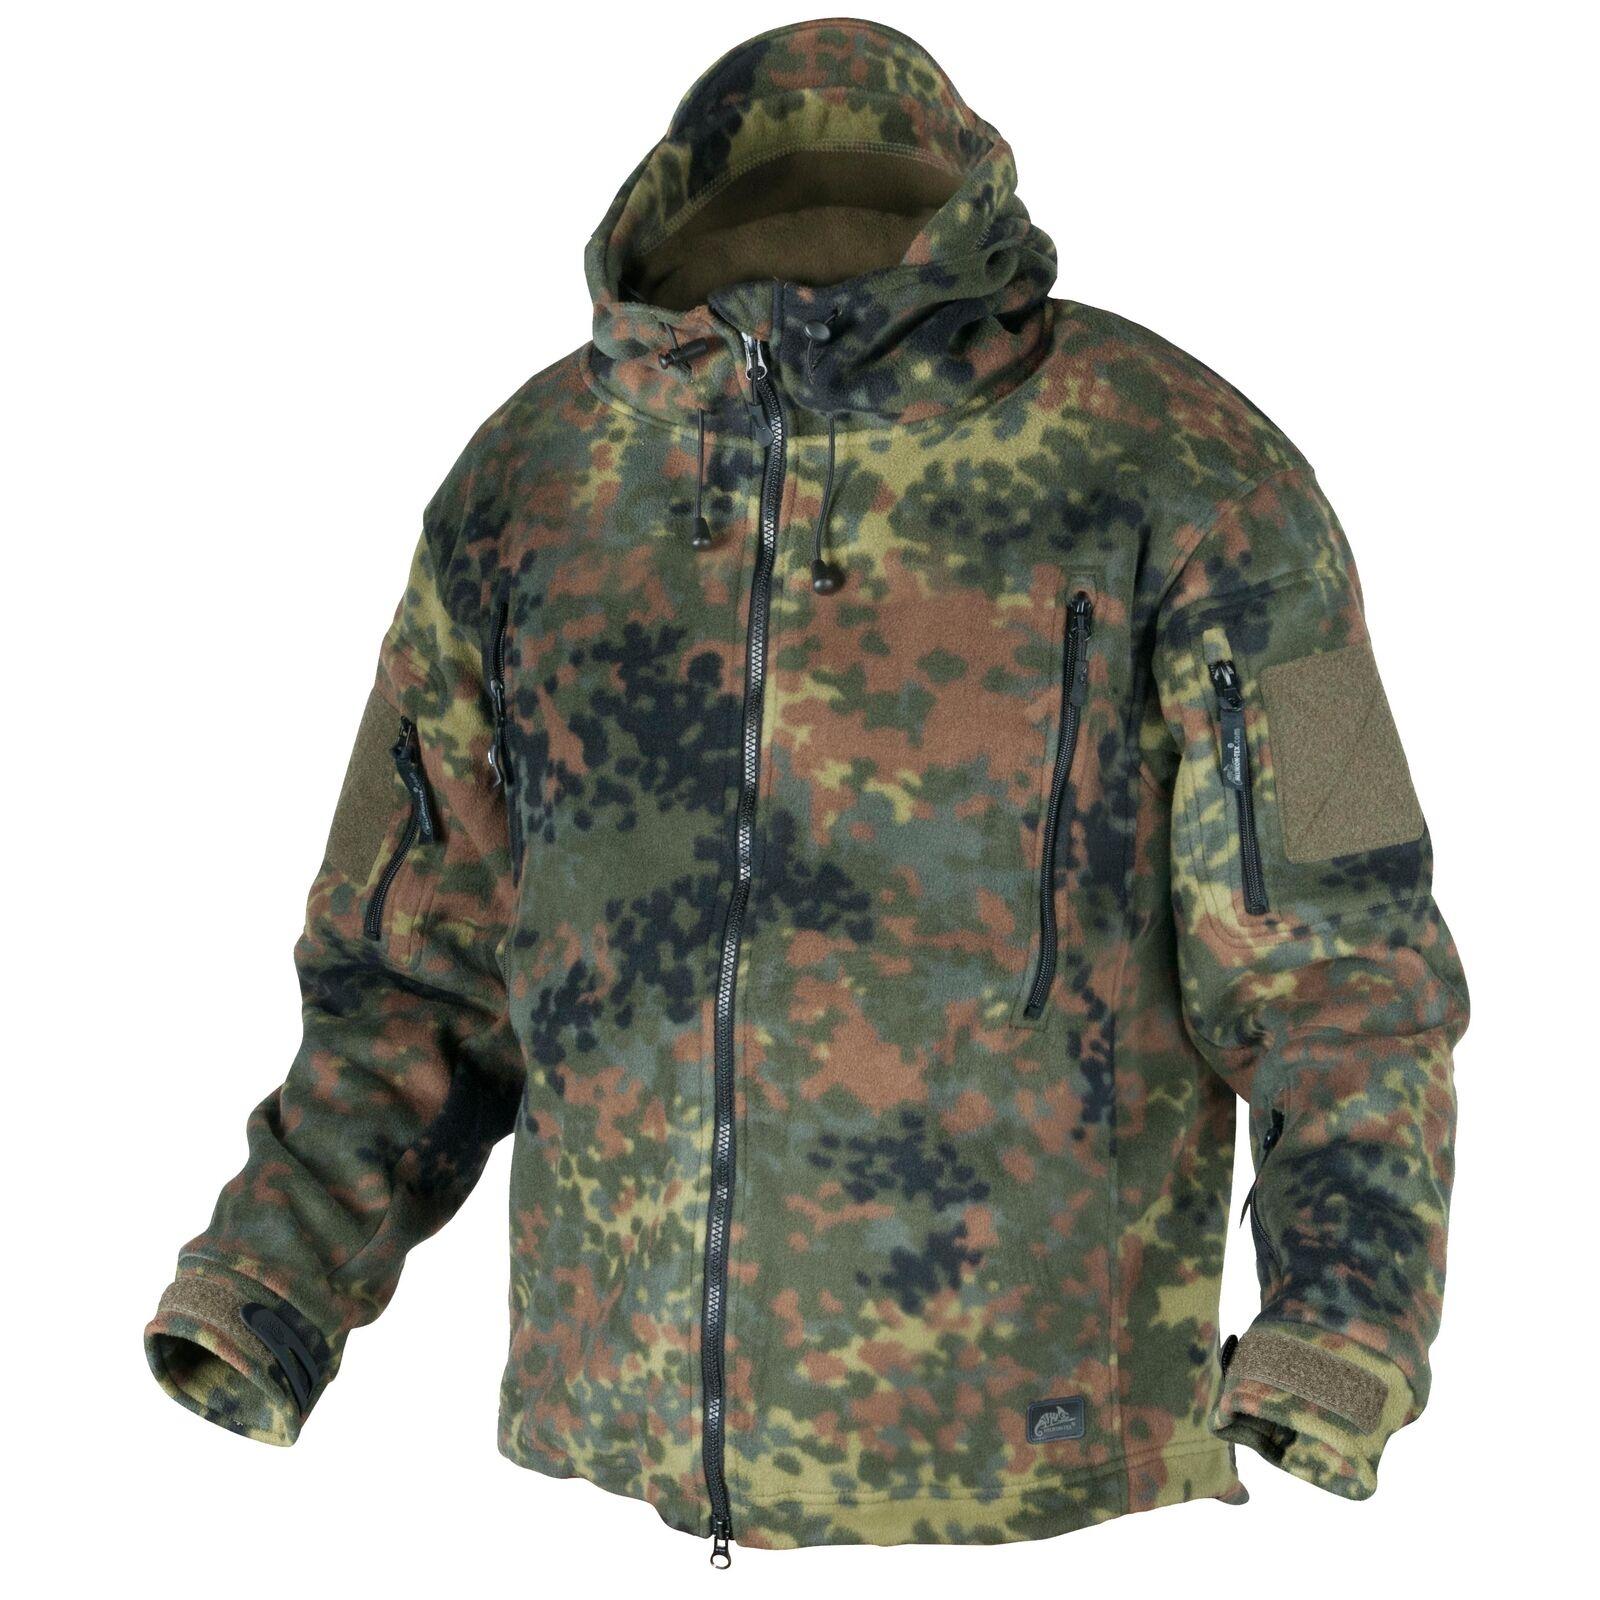 Helikon Tex Patriot Fleece Jacket Jacke Flecktarn BW Outdoor - Fleece 390g m2